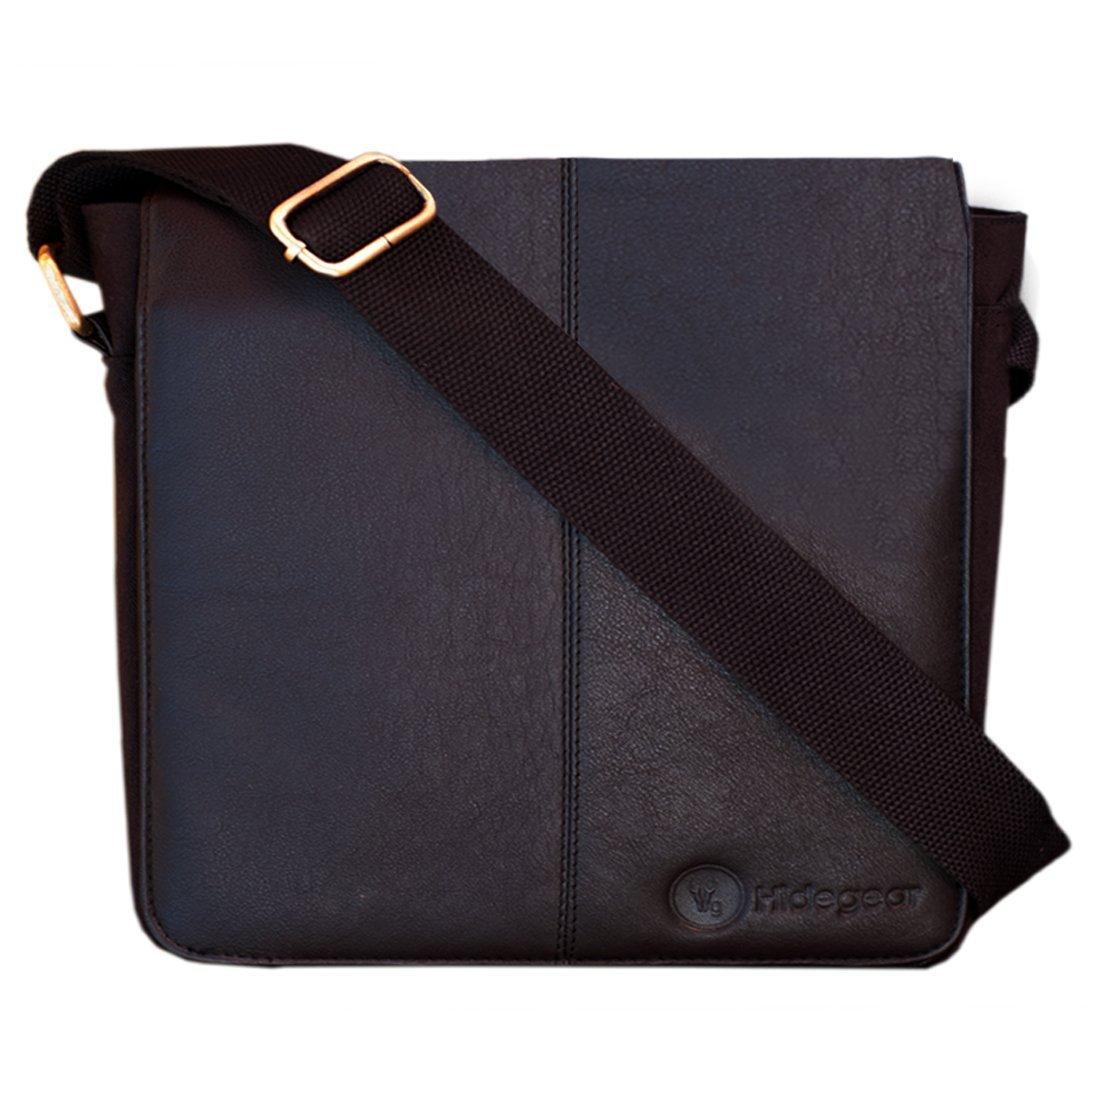 b466a96a1a Hidegear Men s Leather-Canvas Messenger Bag(Brown)  Amazon.in  Bags ...